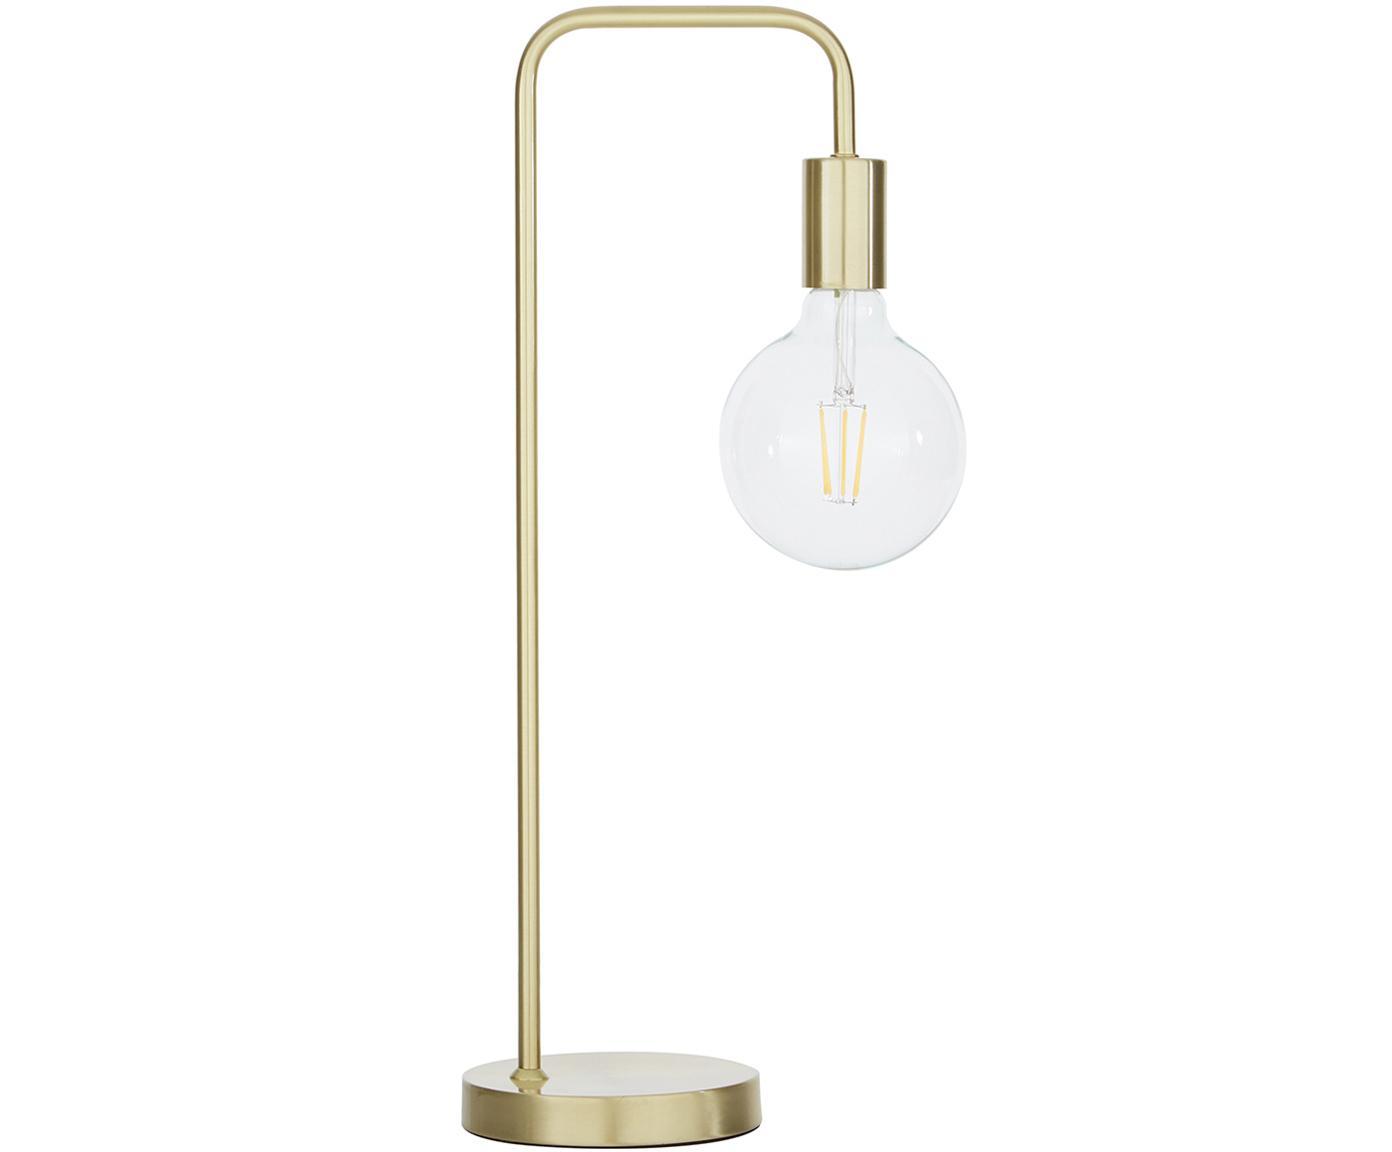 Lampada da tavolo Flow, Ottone spazzolato, Larg. 22 x Alt. 56 cm